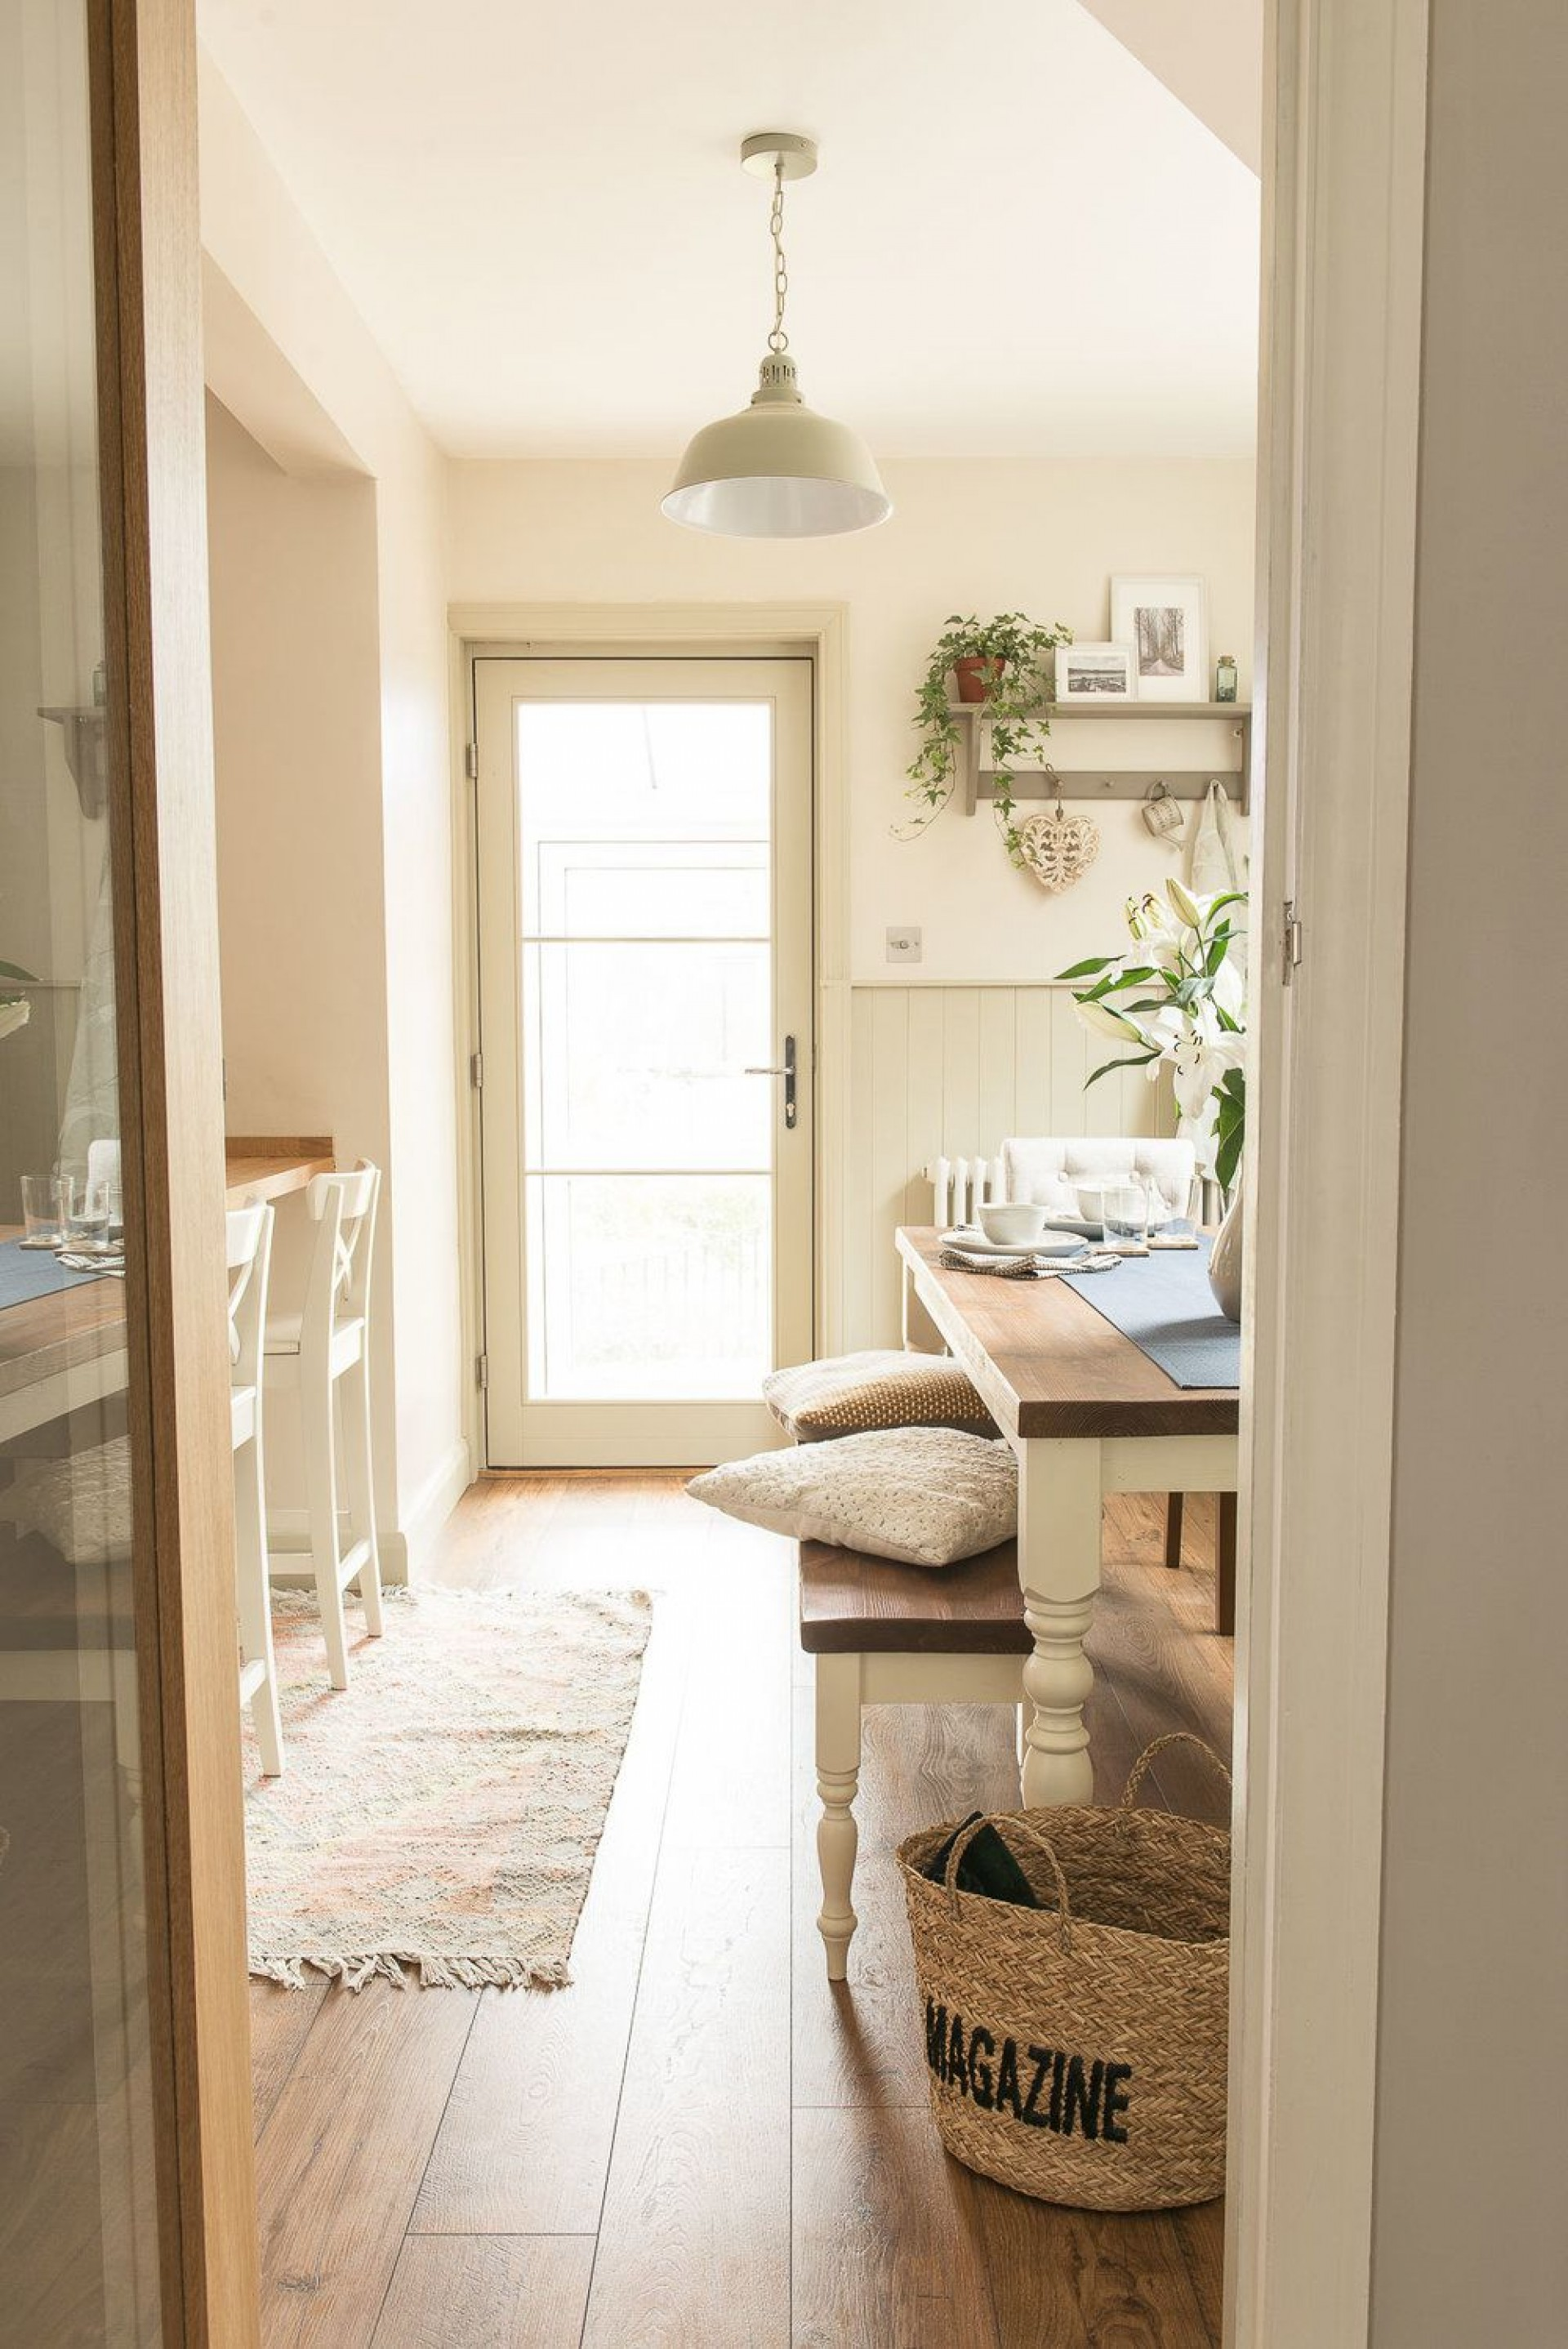 005 Wondrou Best Home Renovation Budget Template Excel Free High Definition 1920